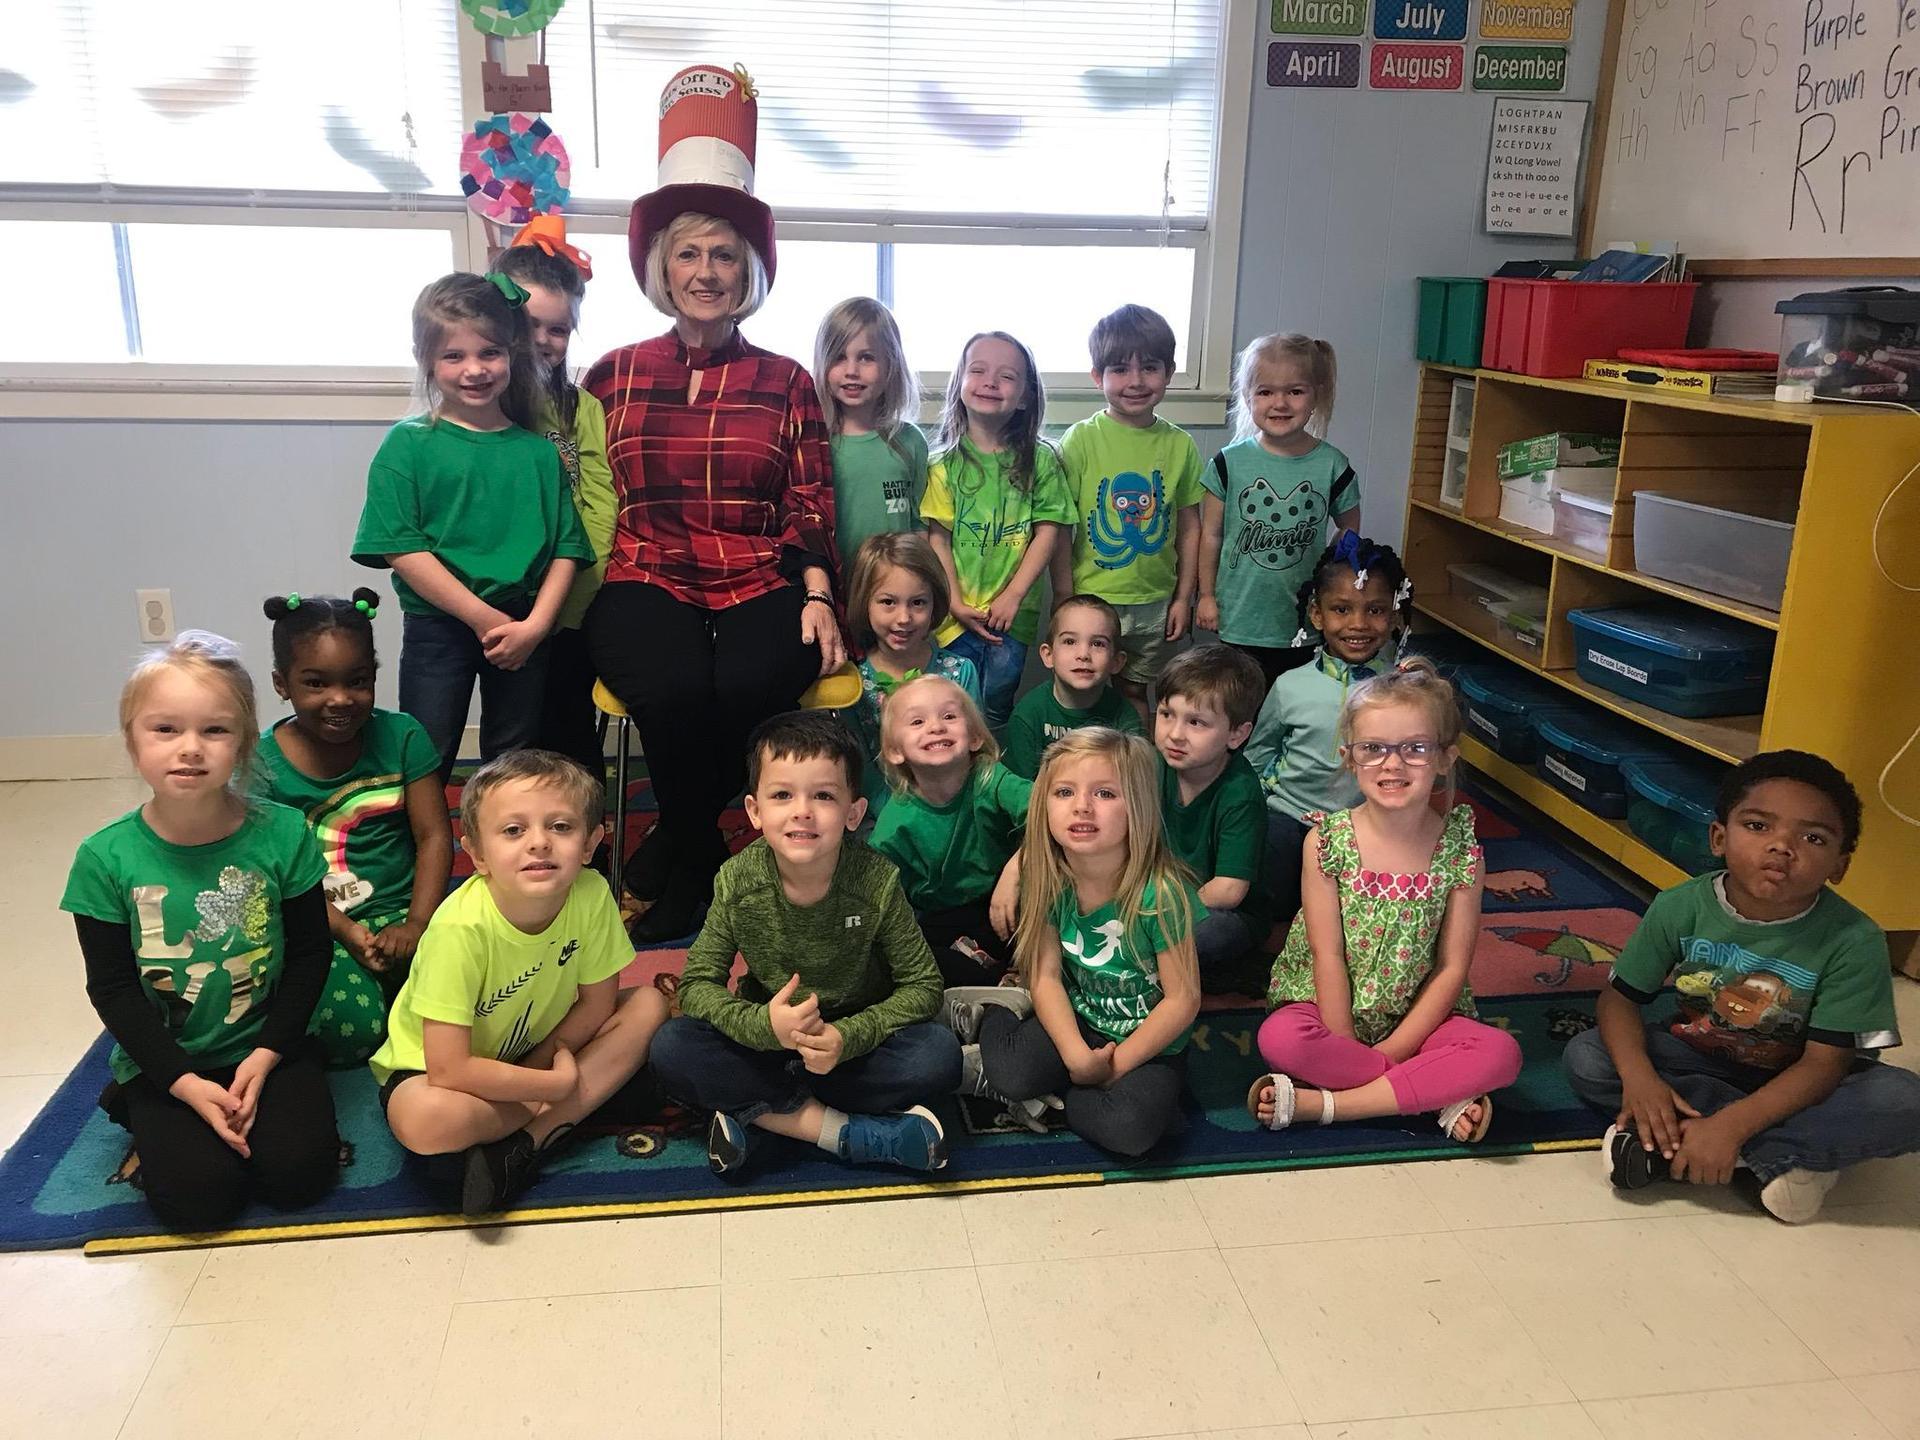 LCSD students celebrating Dr. Seuss Day